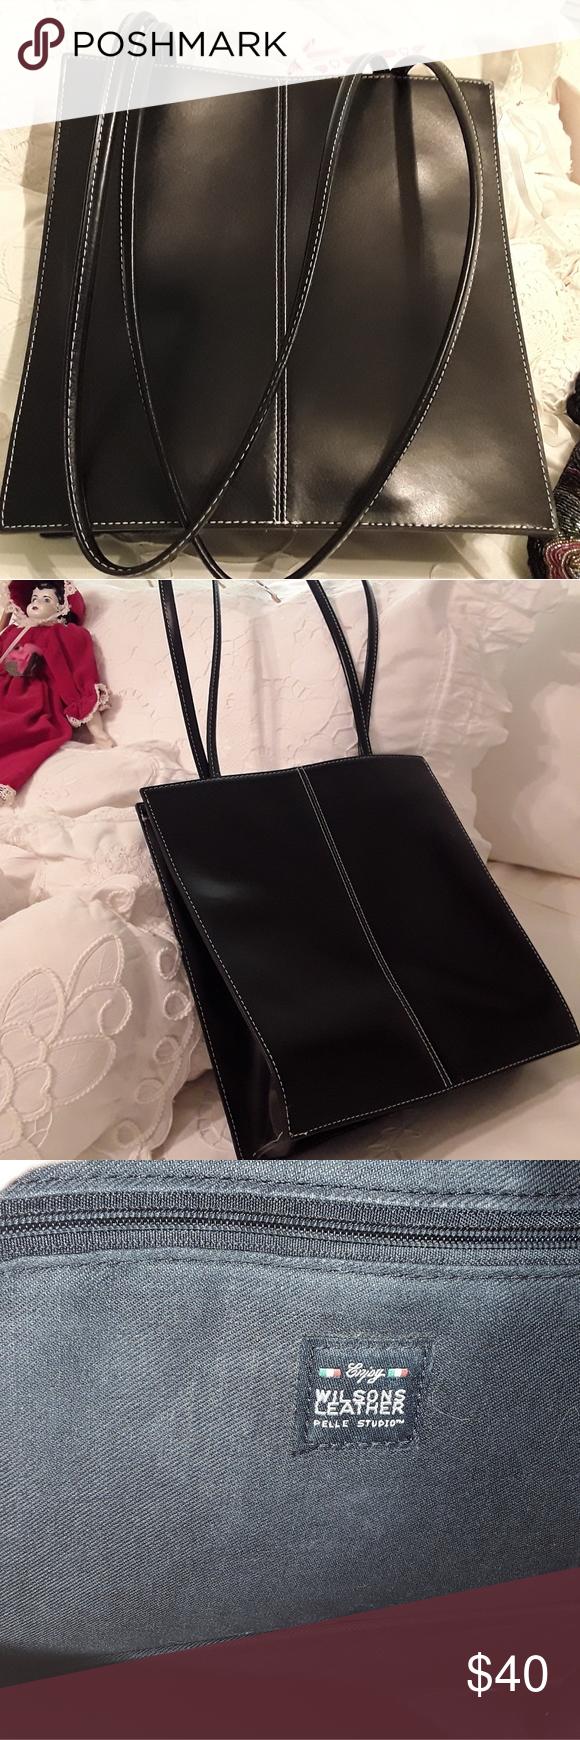 Very elegant ladies wilson leather handbag /tote Leather